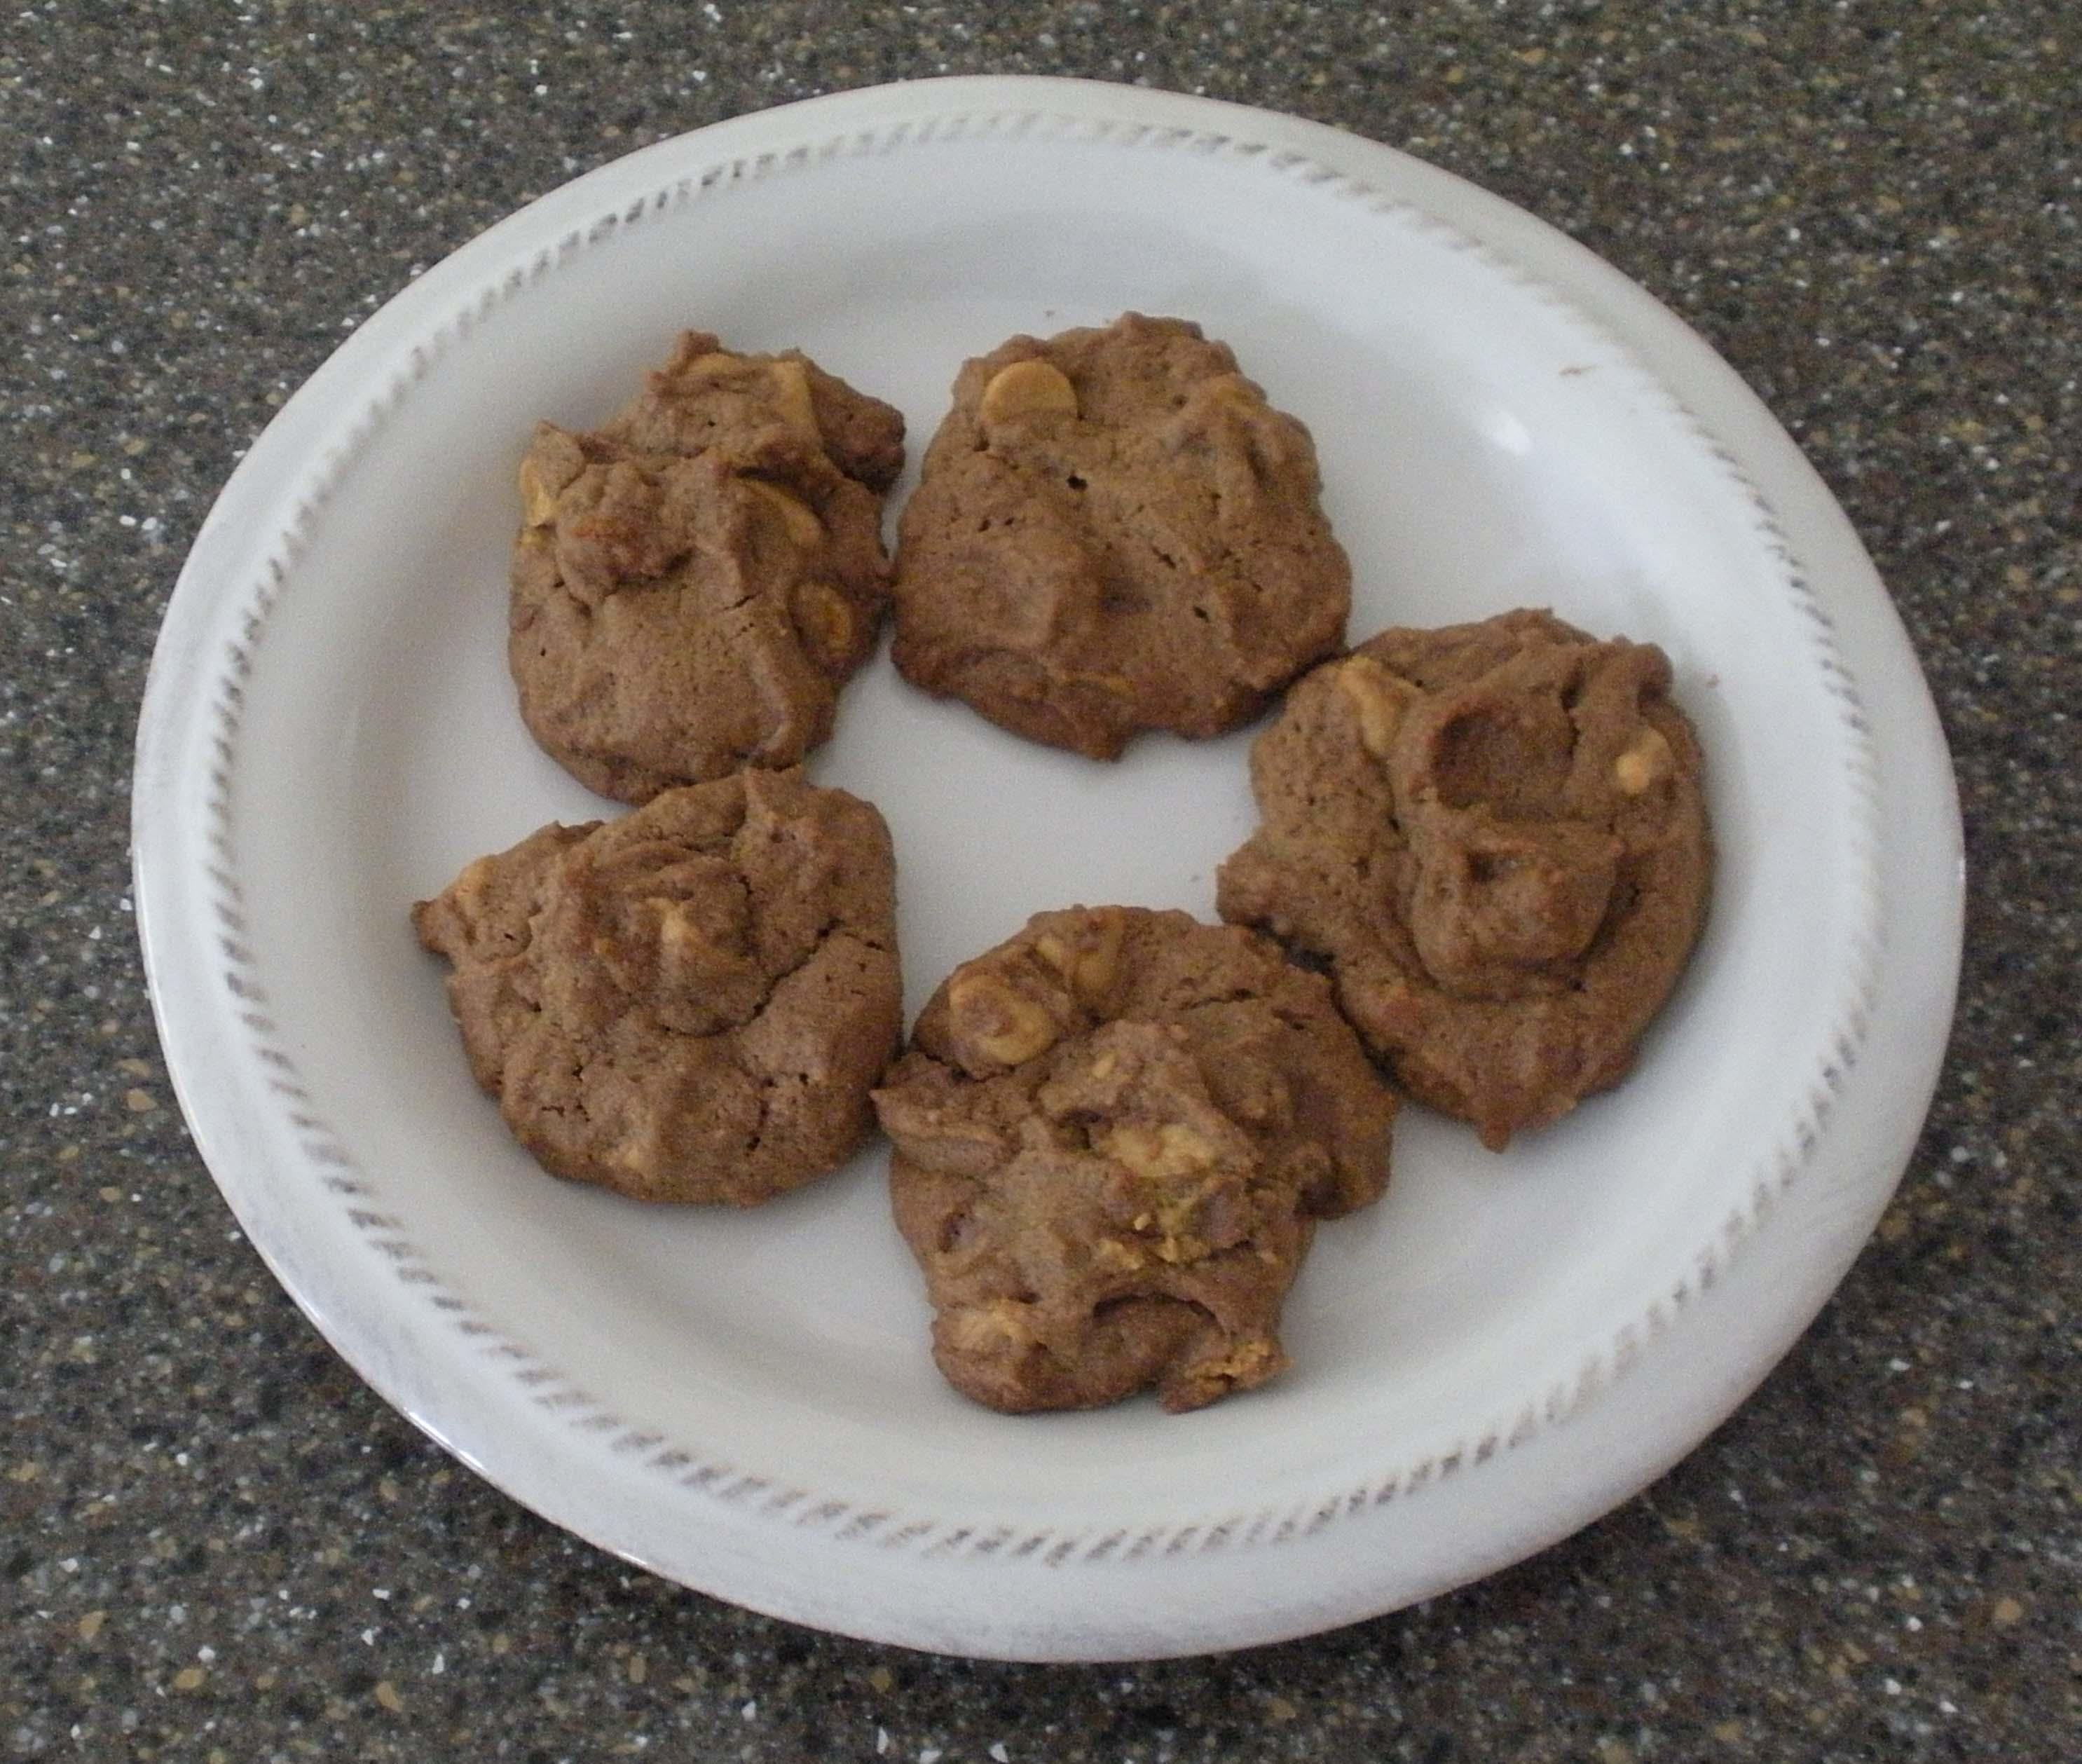 Chocolate Peanut Butter Cup Cookies | Bermudaonion's Weblog